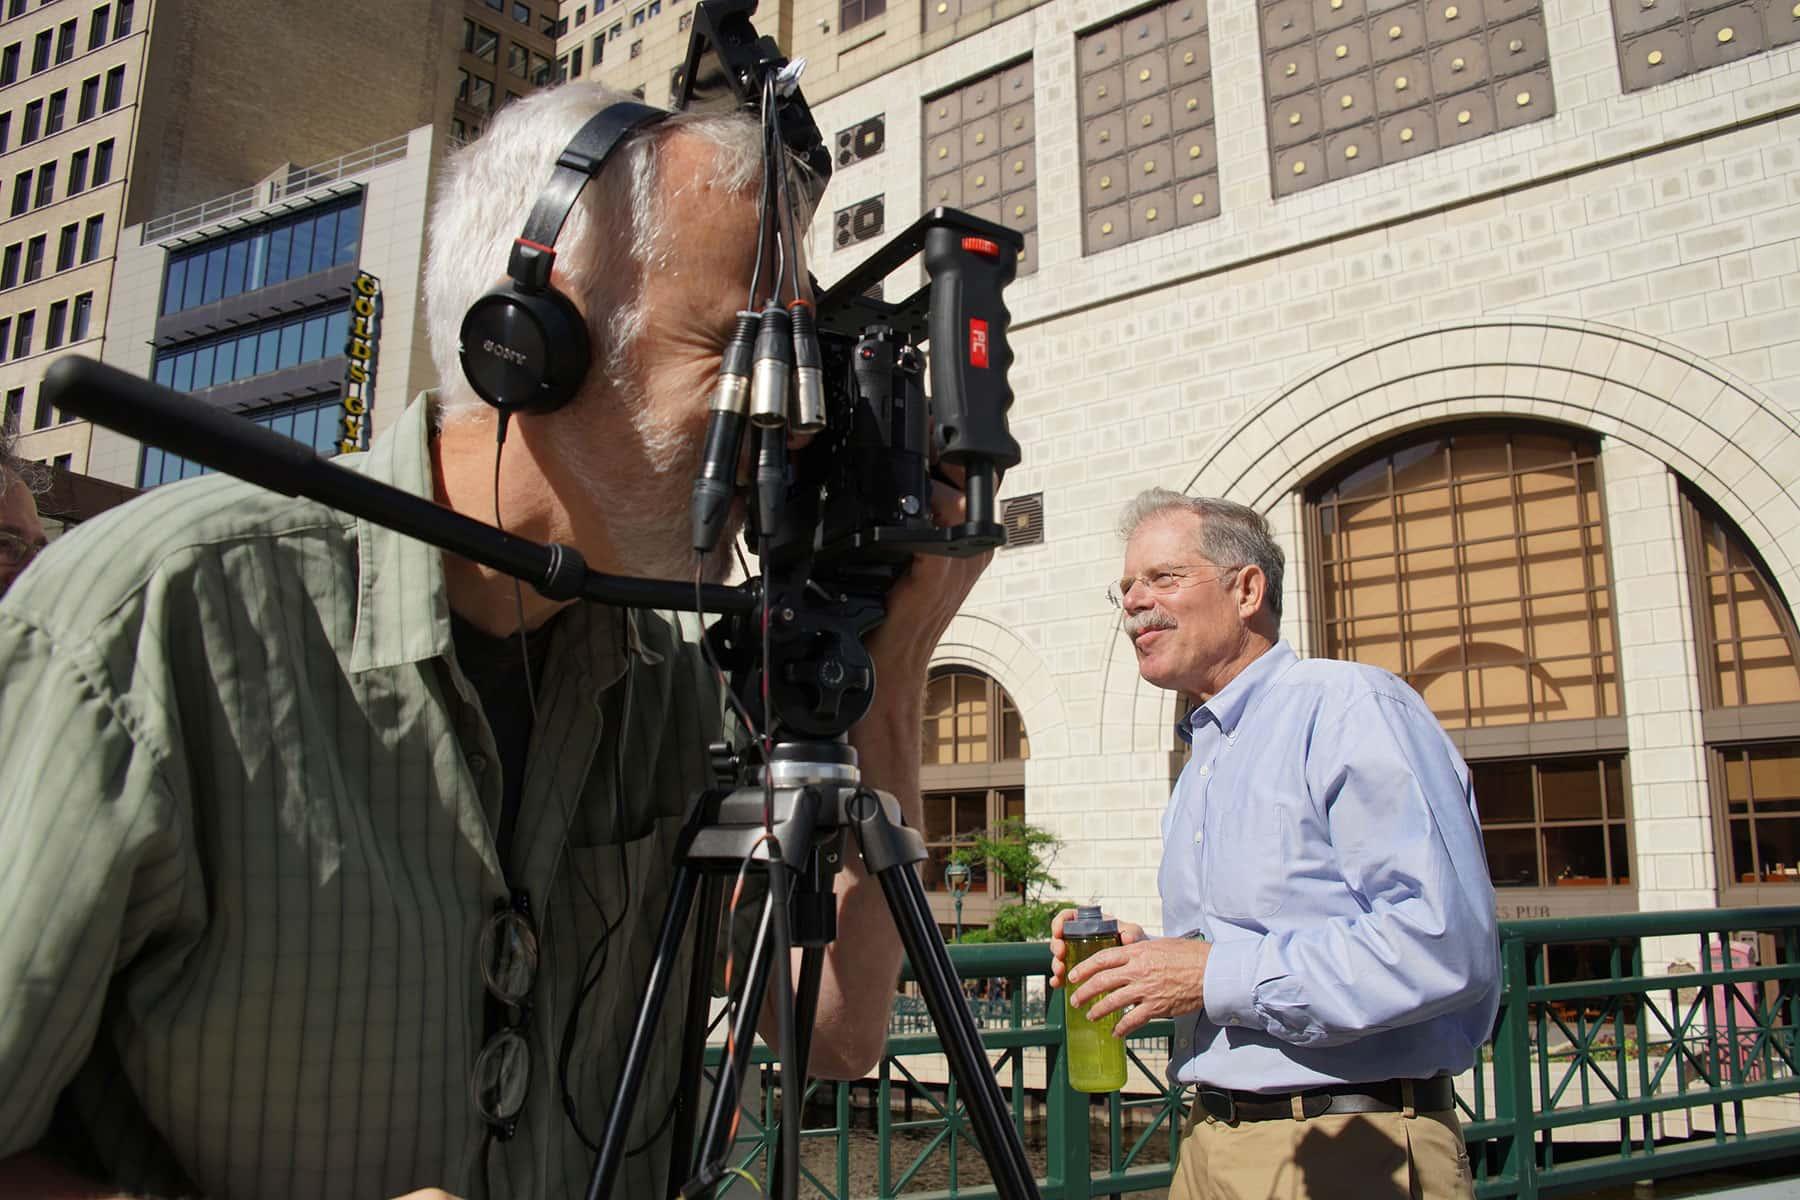 Photo Essay Filming On Active Bridges  The Milwaukee Independent Photo Essay Filming On Active Bridges